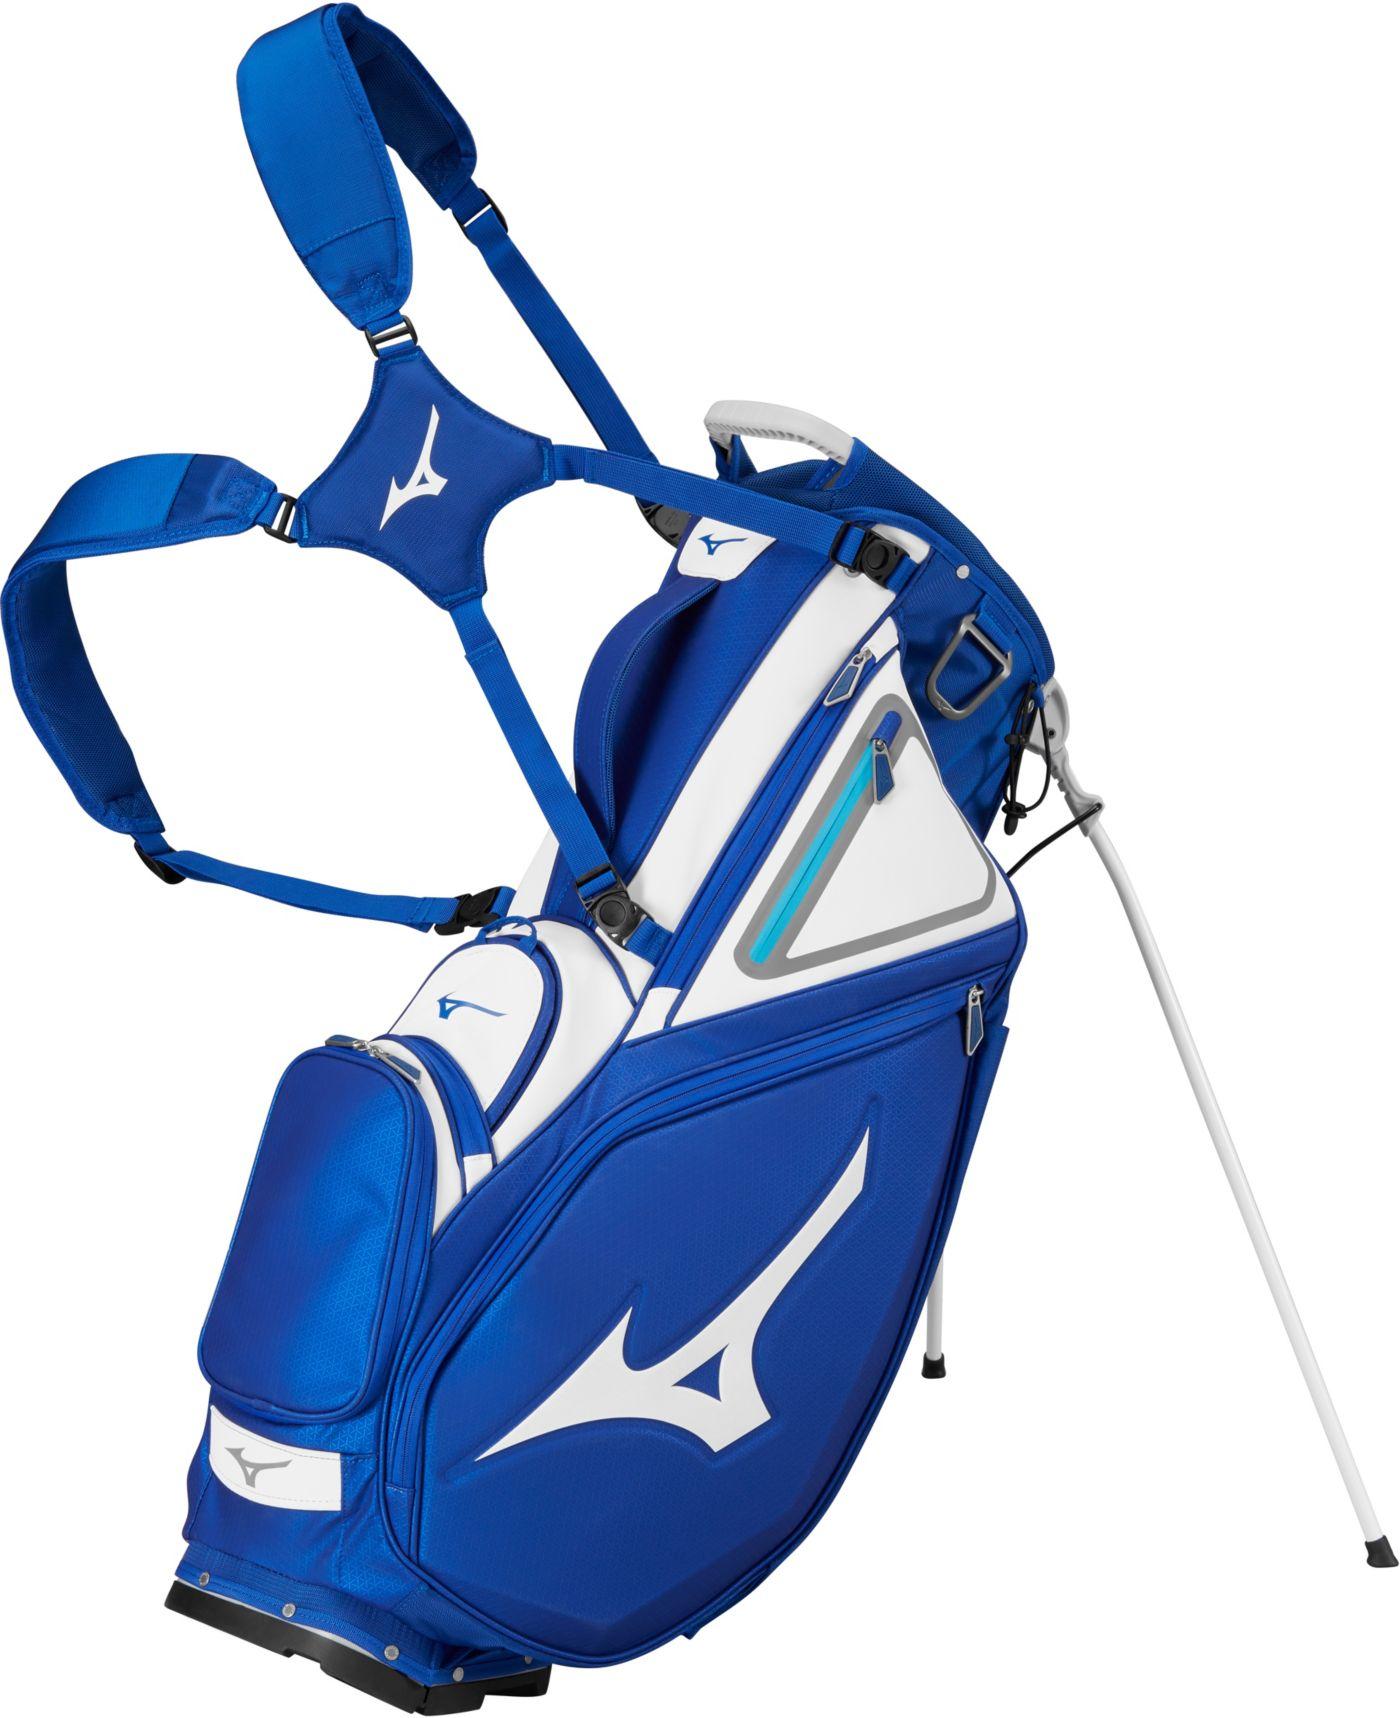 Mizuno Pro 6-Way Stand Golf Bag